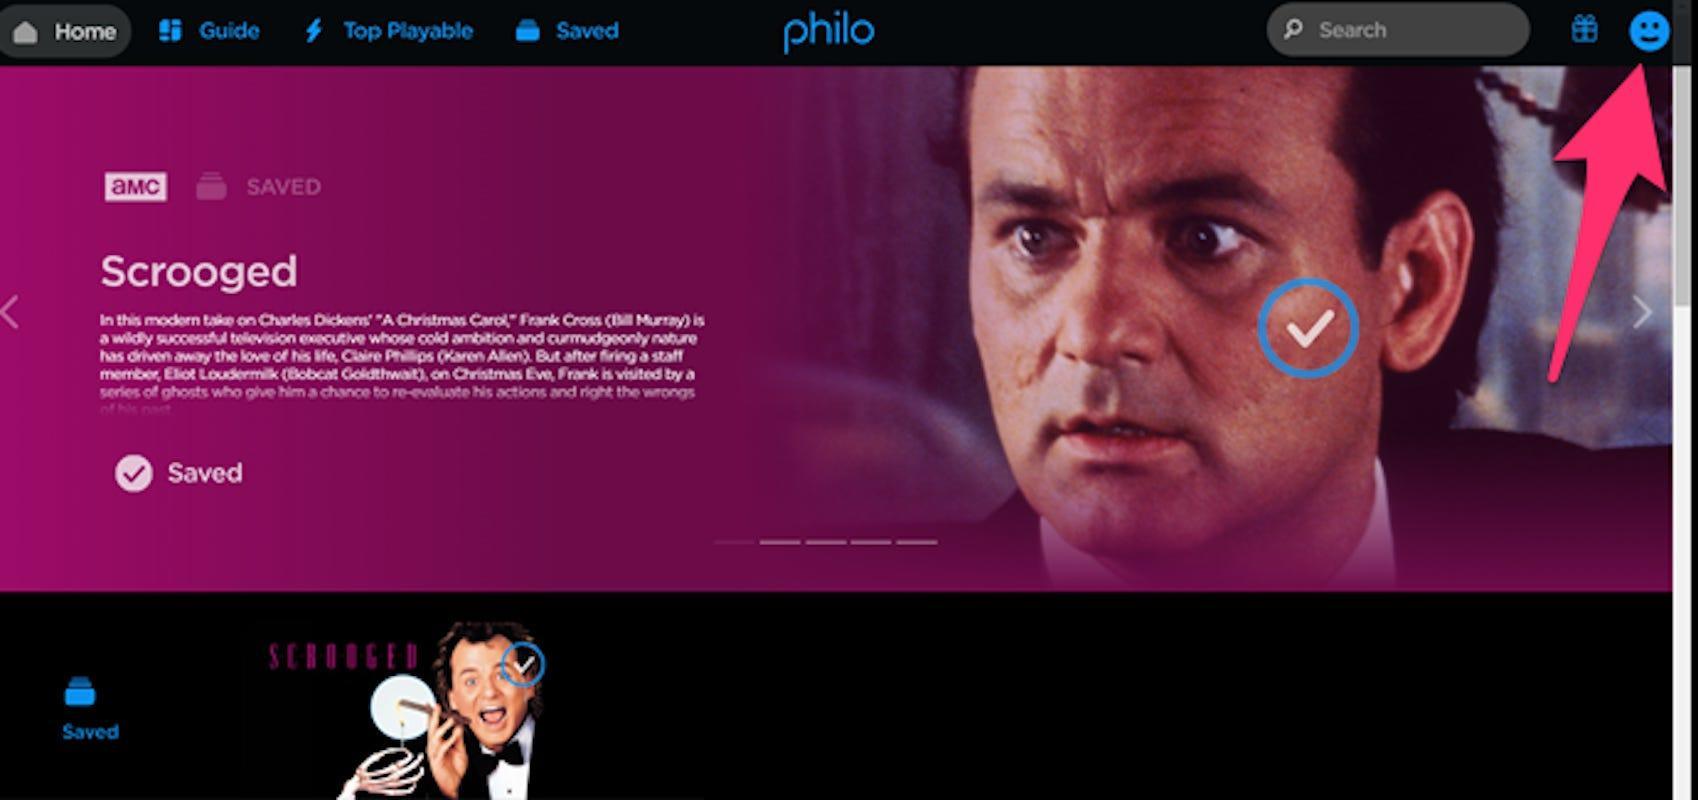 cancelling philo tv